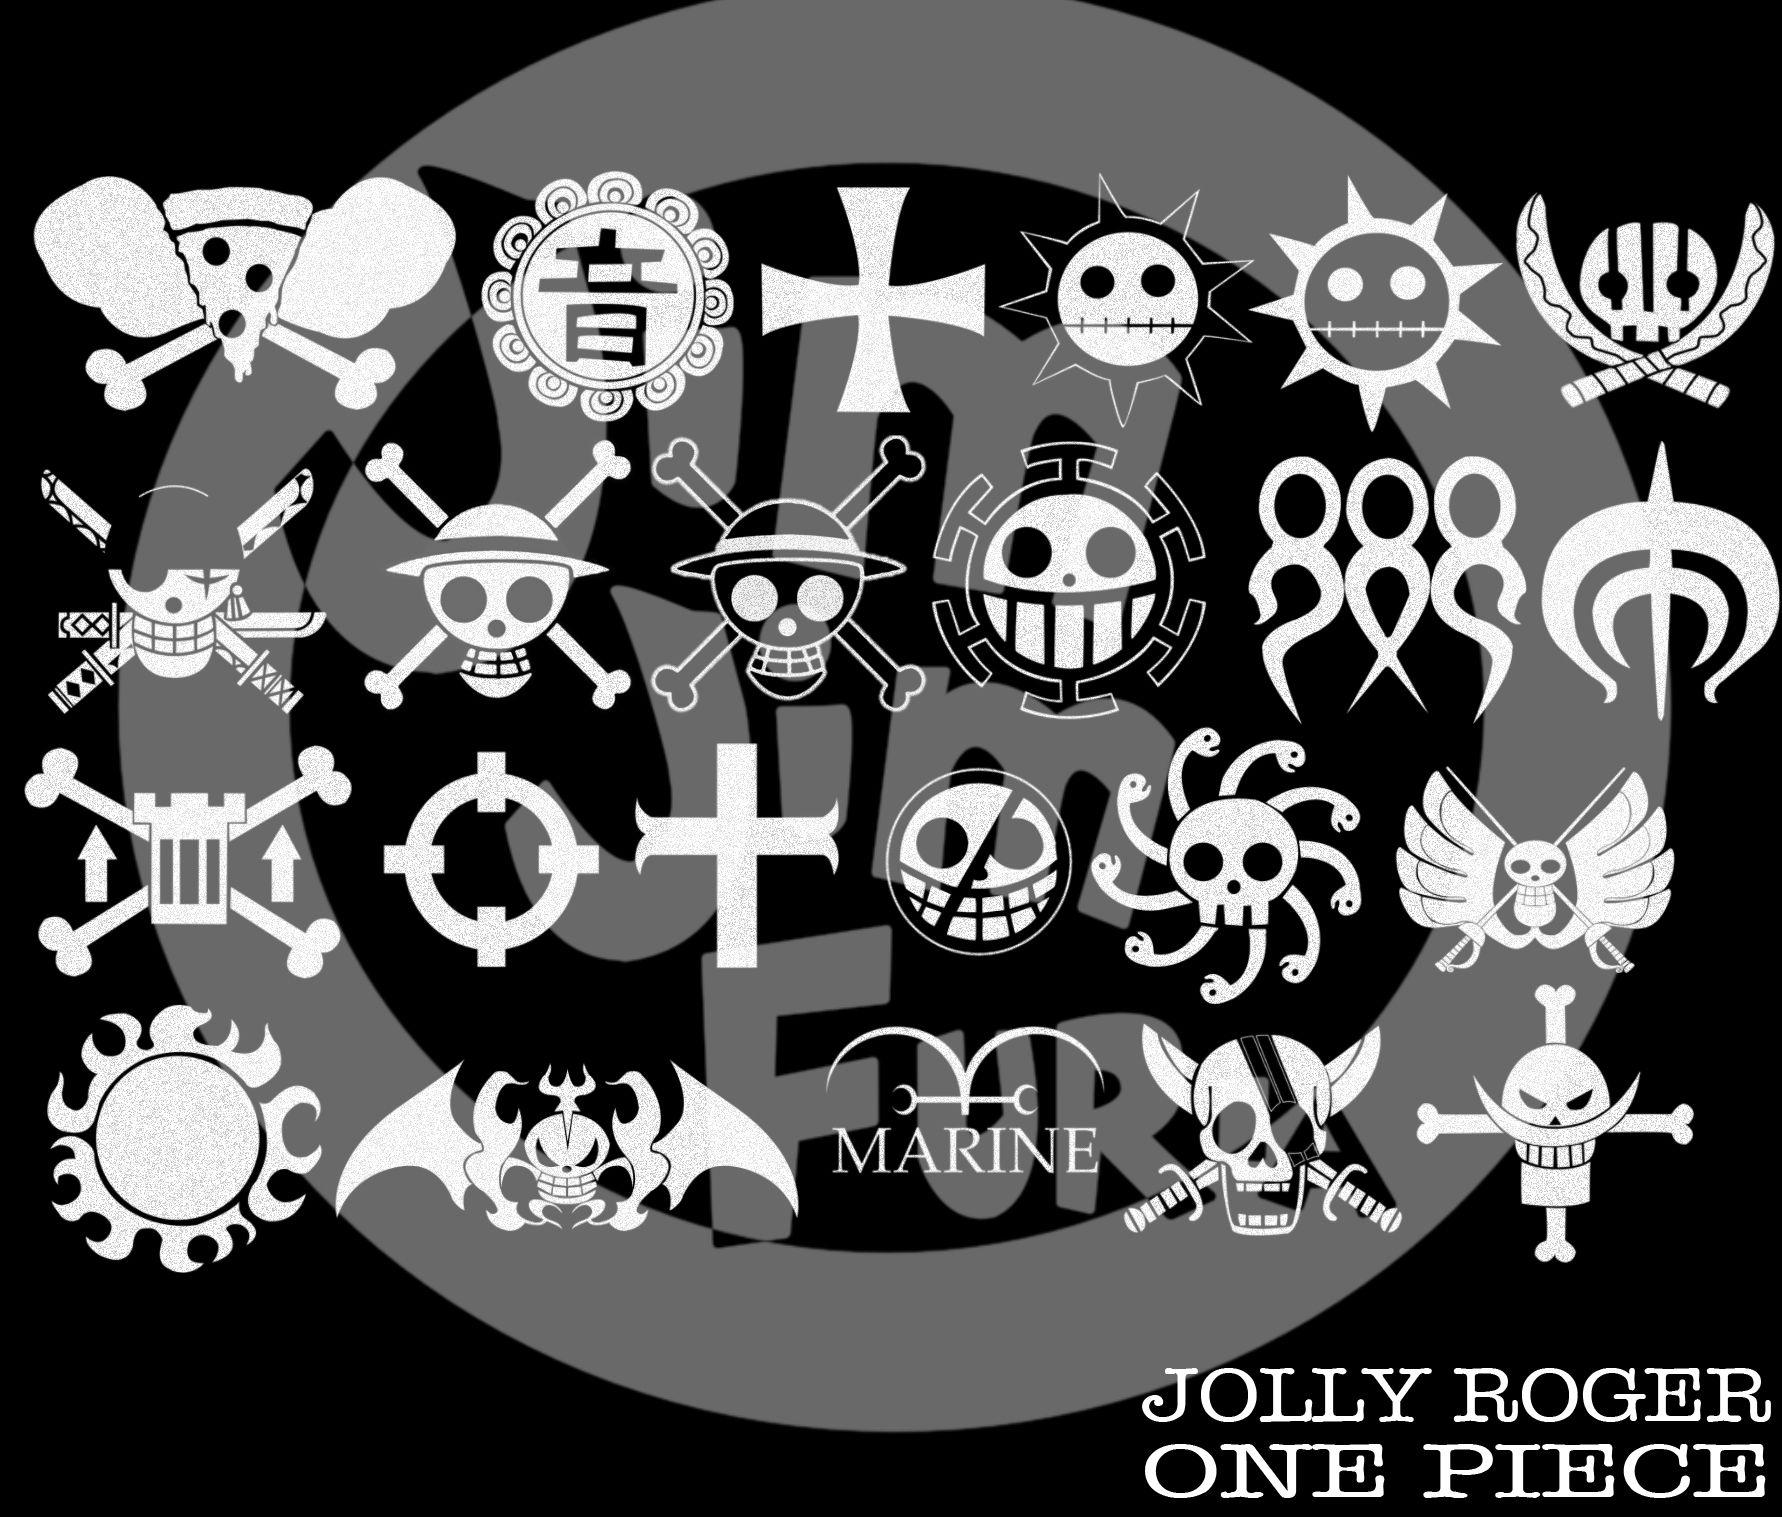 One Piece Jolly Roger Brushes Tatuagem Tatuagem Preta Desenhos